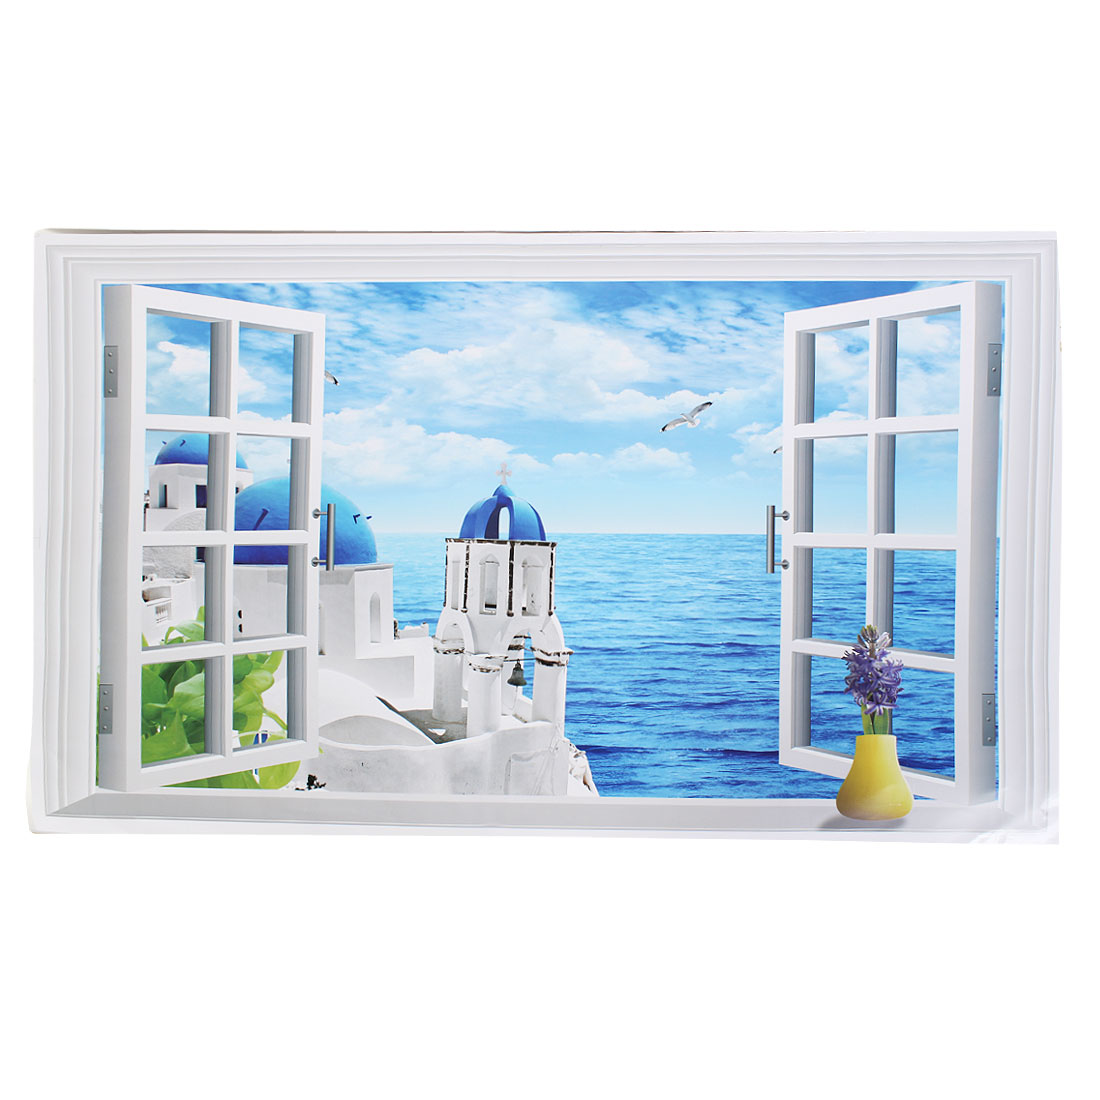 Home Room Fake Window Seaview Background PVC Wall Sticker Wallpaper